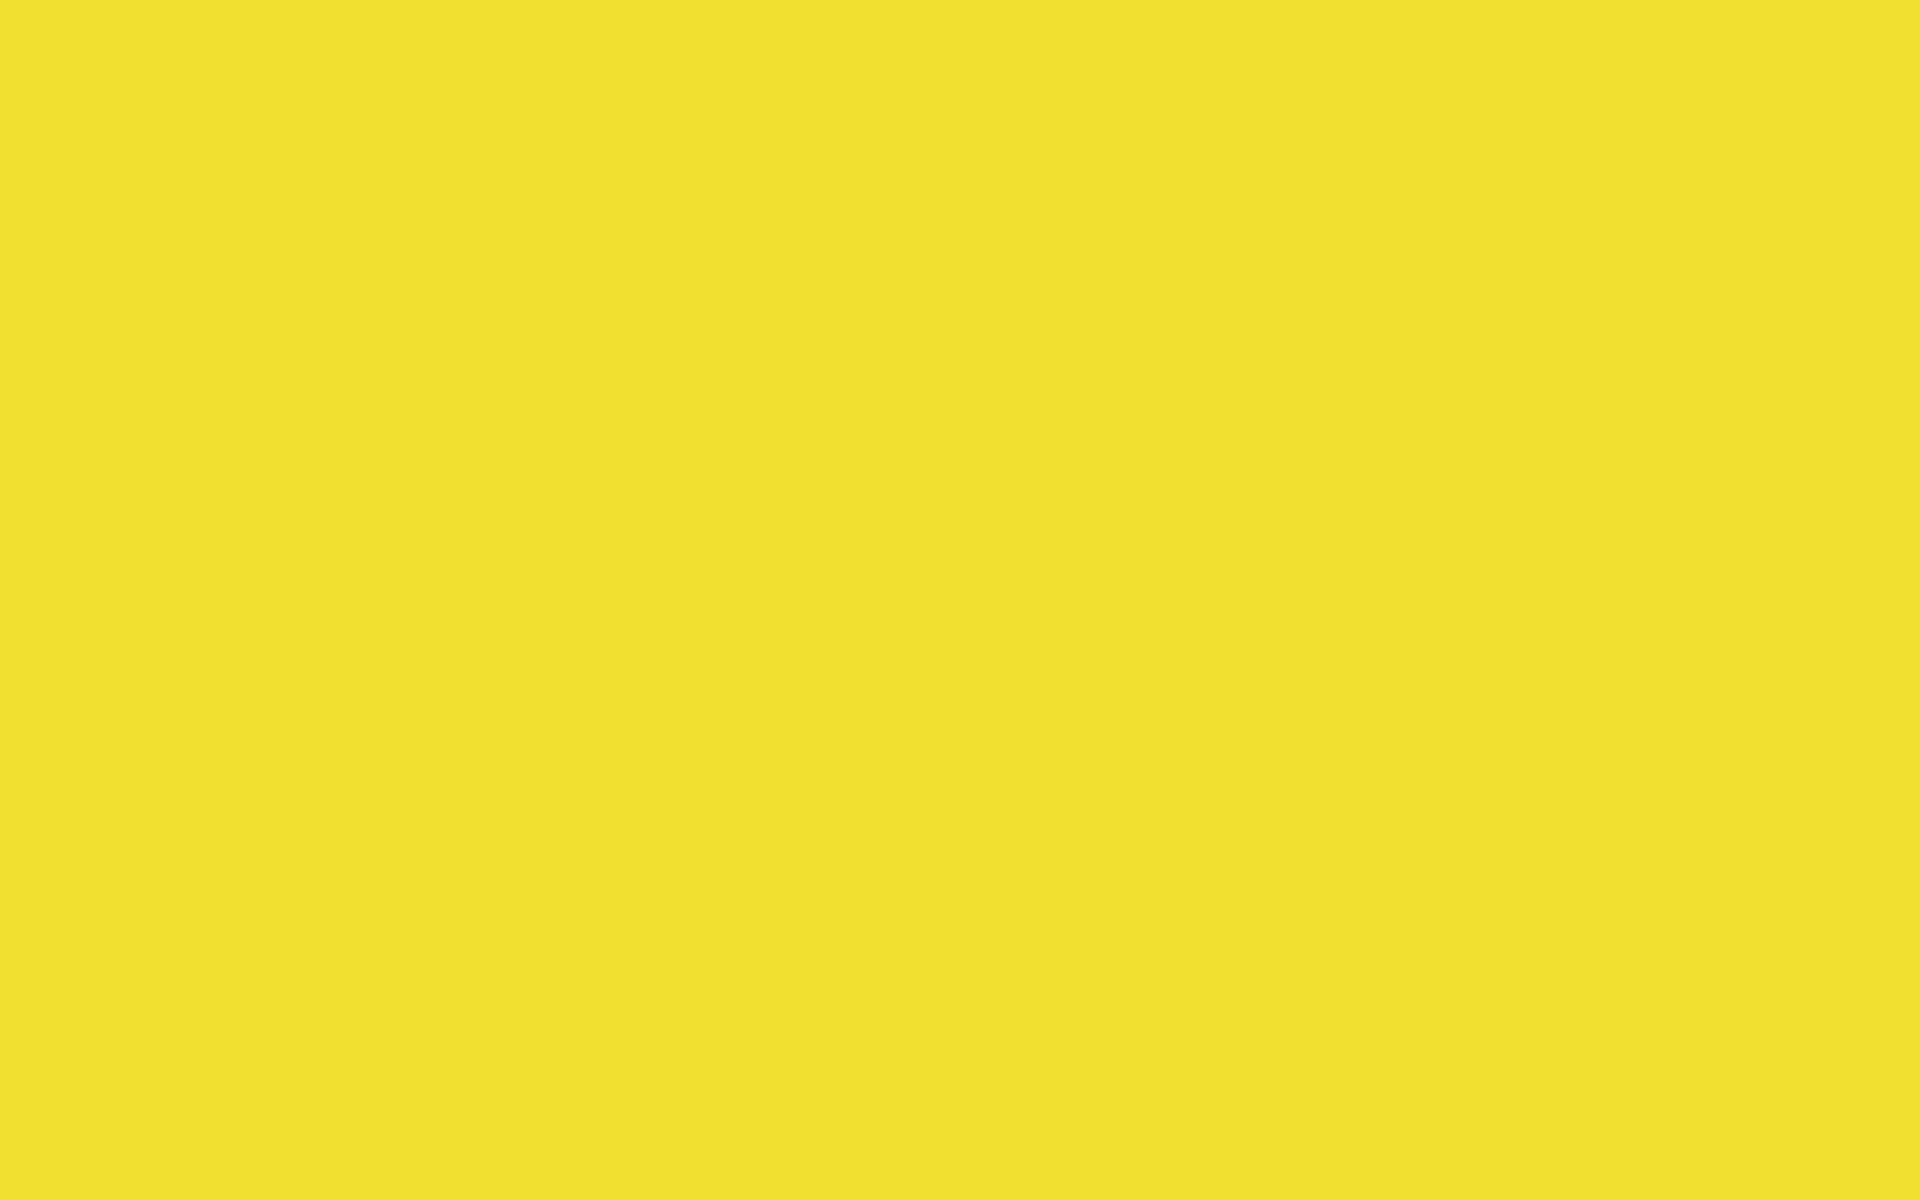 1920x1200 Dandelion Solid Color Background